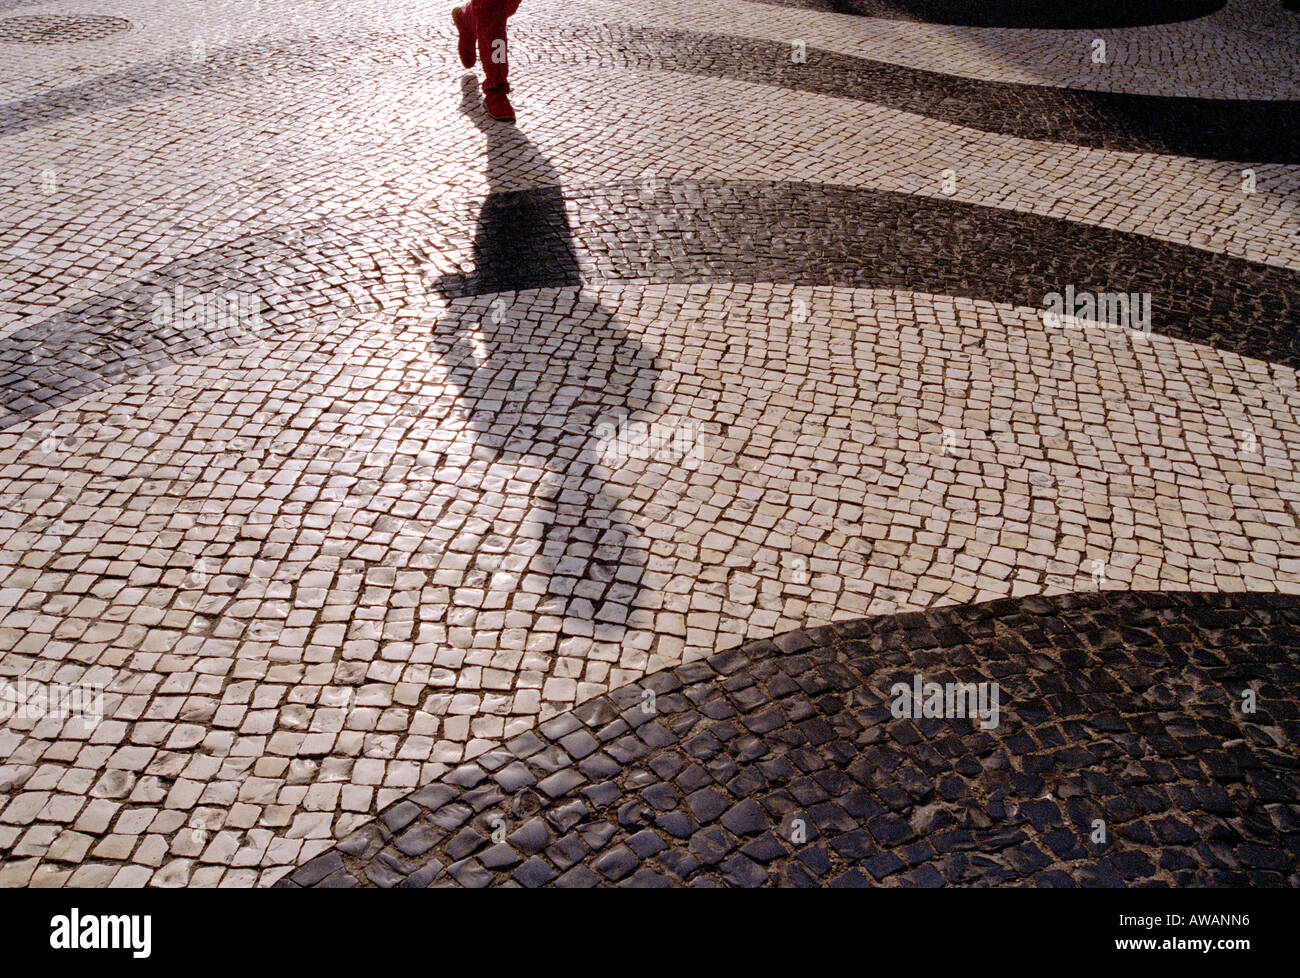 A mans feet and long shadow walking across a Mosaic Street, Largo de Santo Agostinho, Macau. - Stock Image